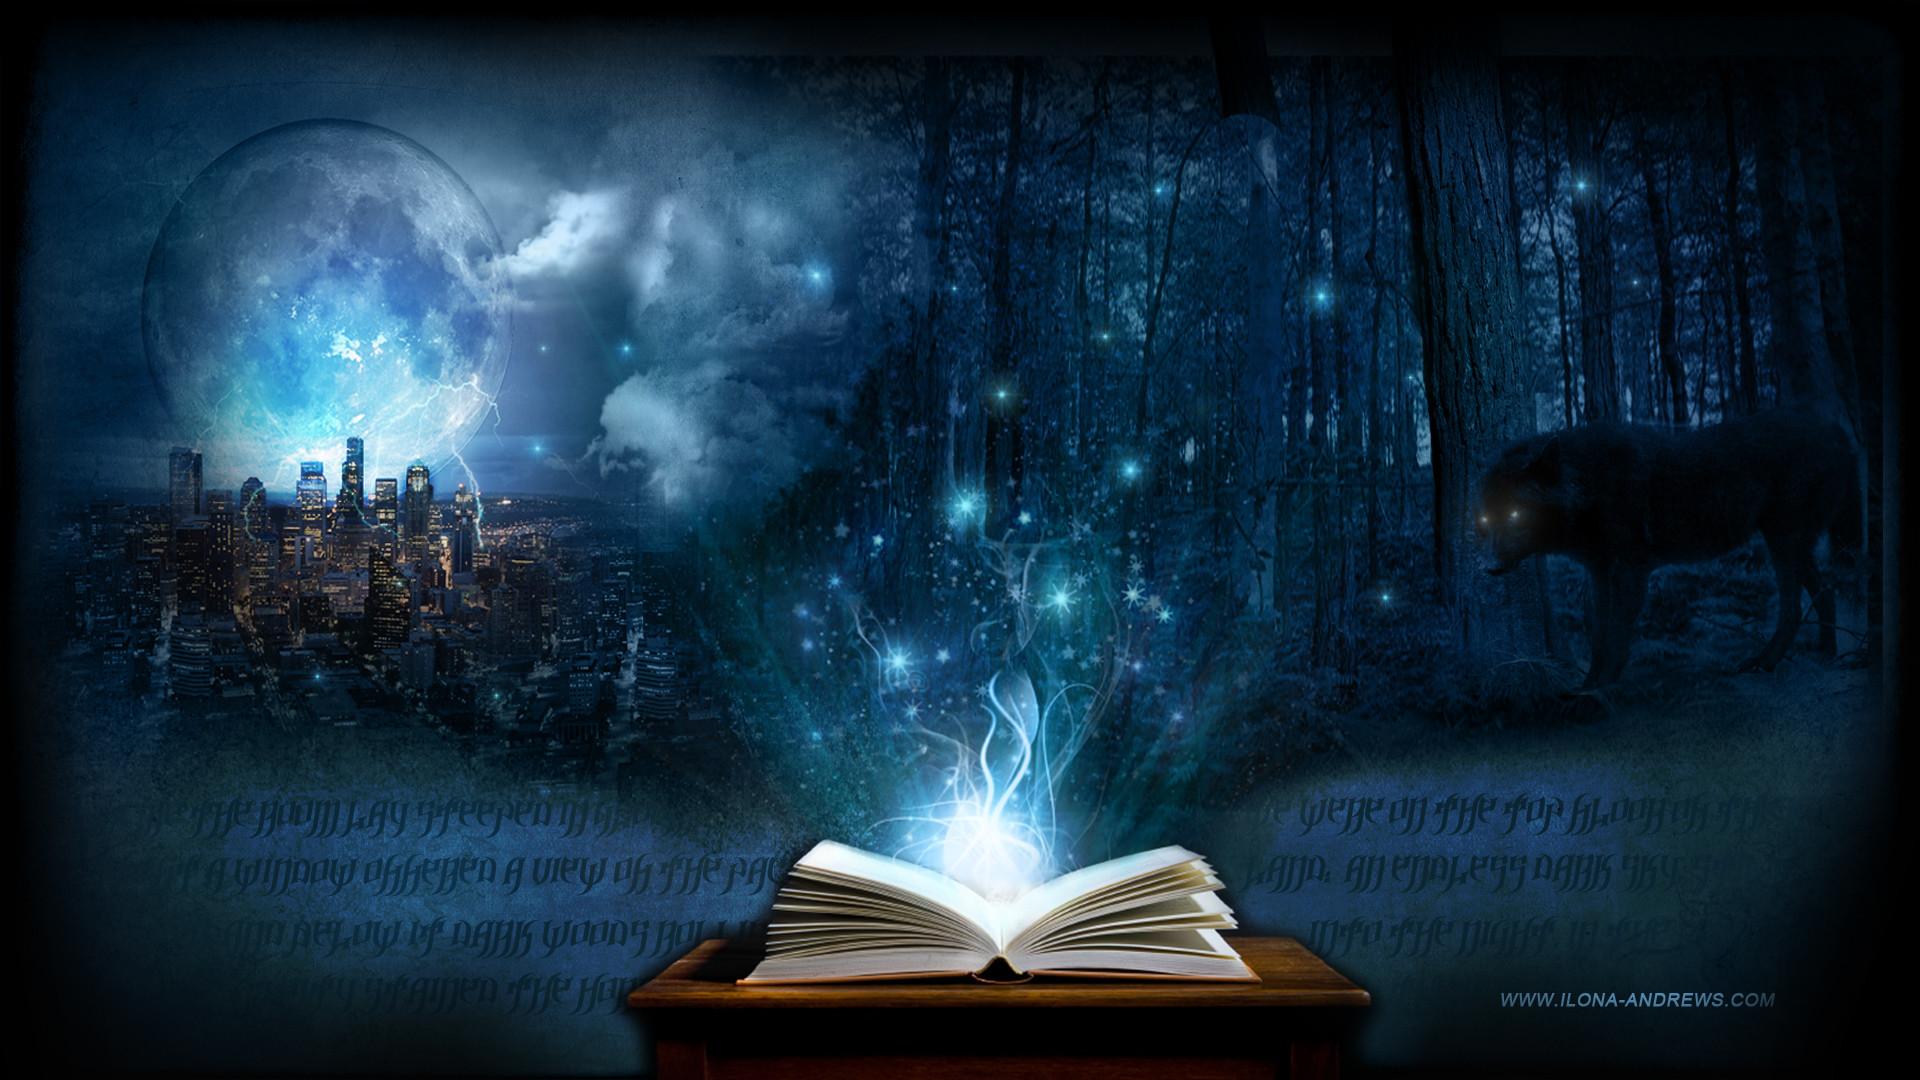 1920x1080 wallpaper book magic 1920x1080 1920x1080